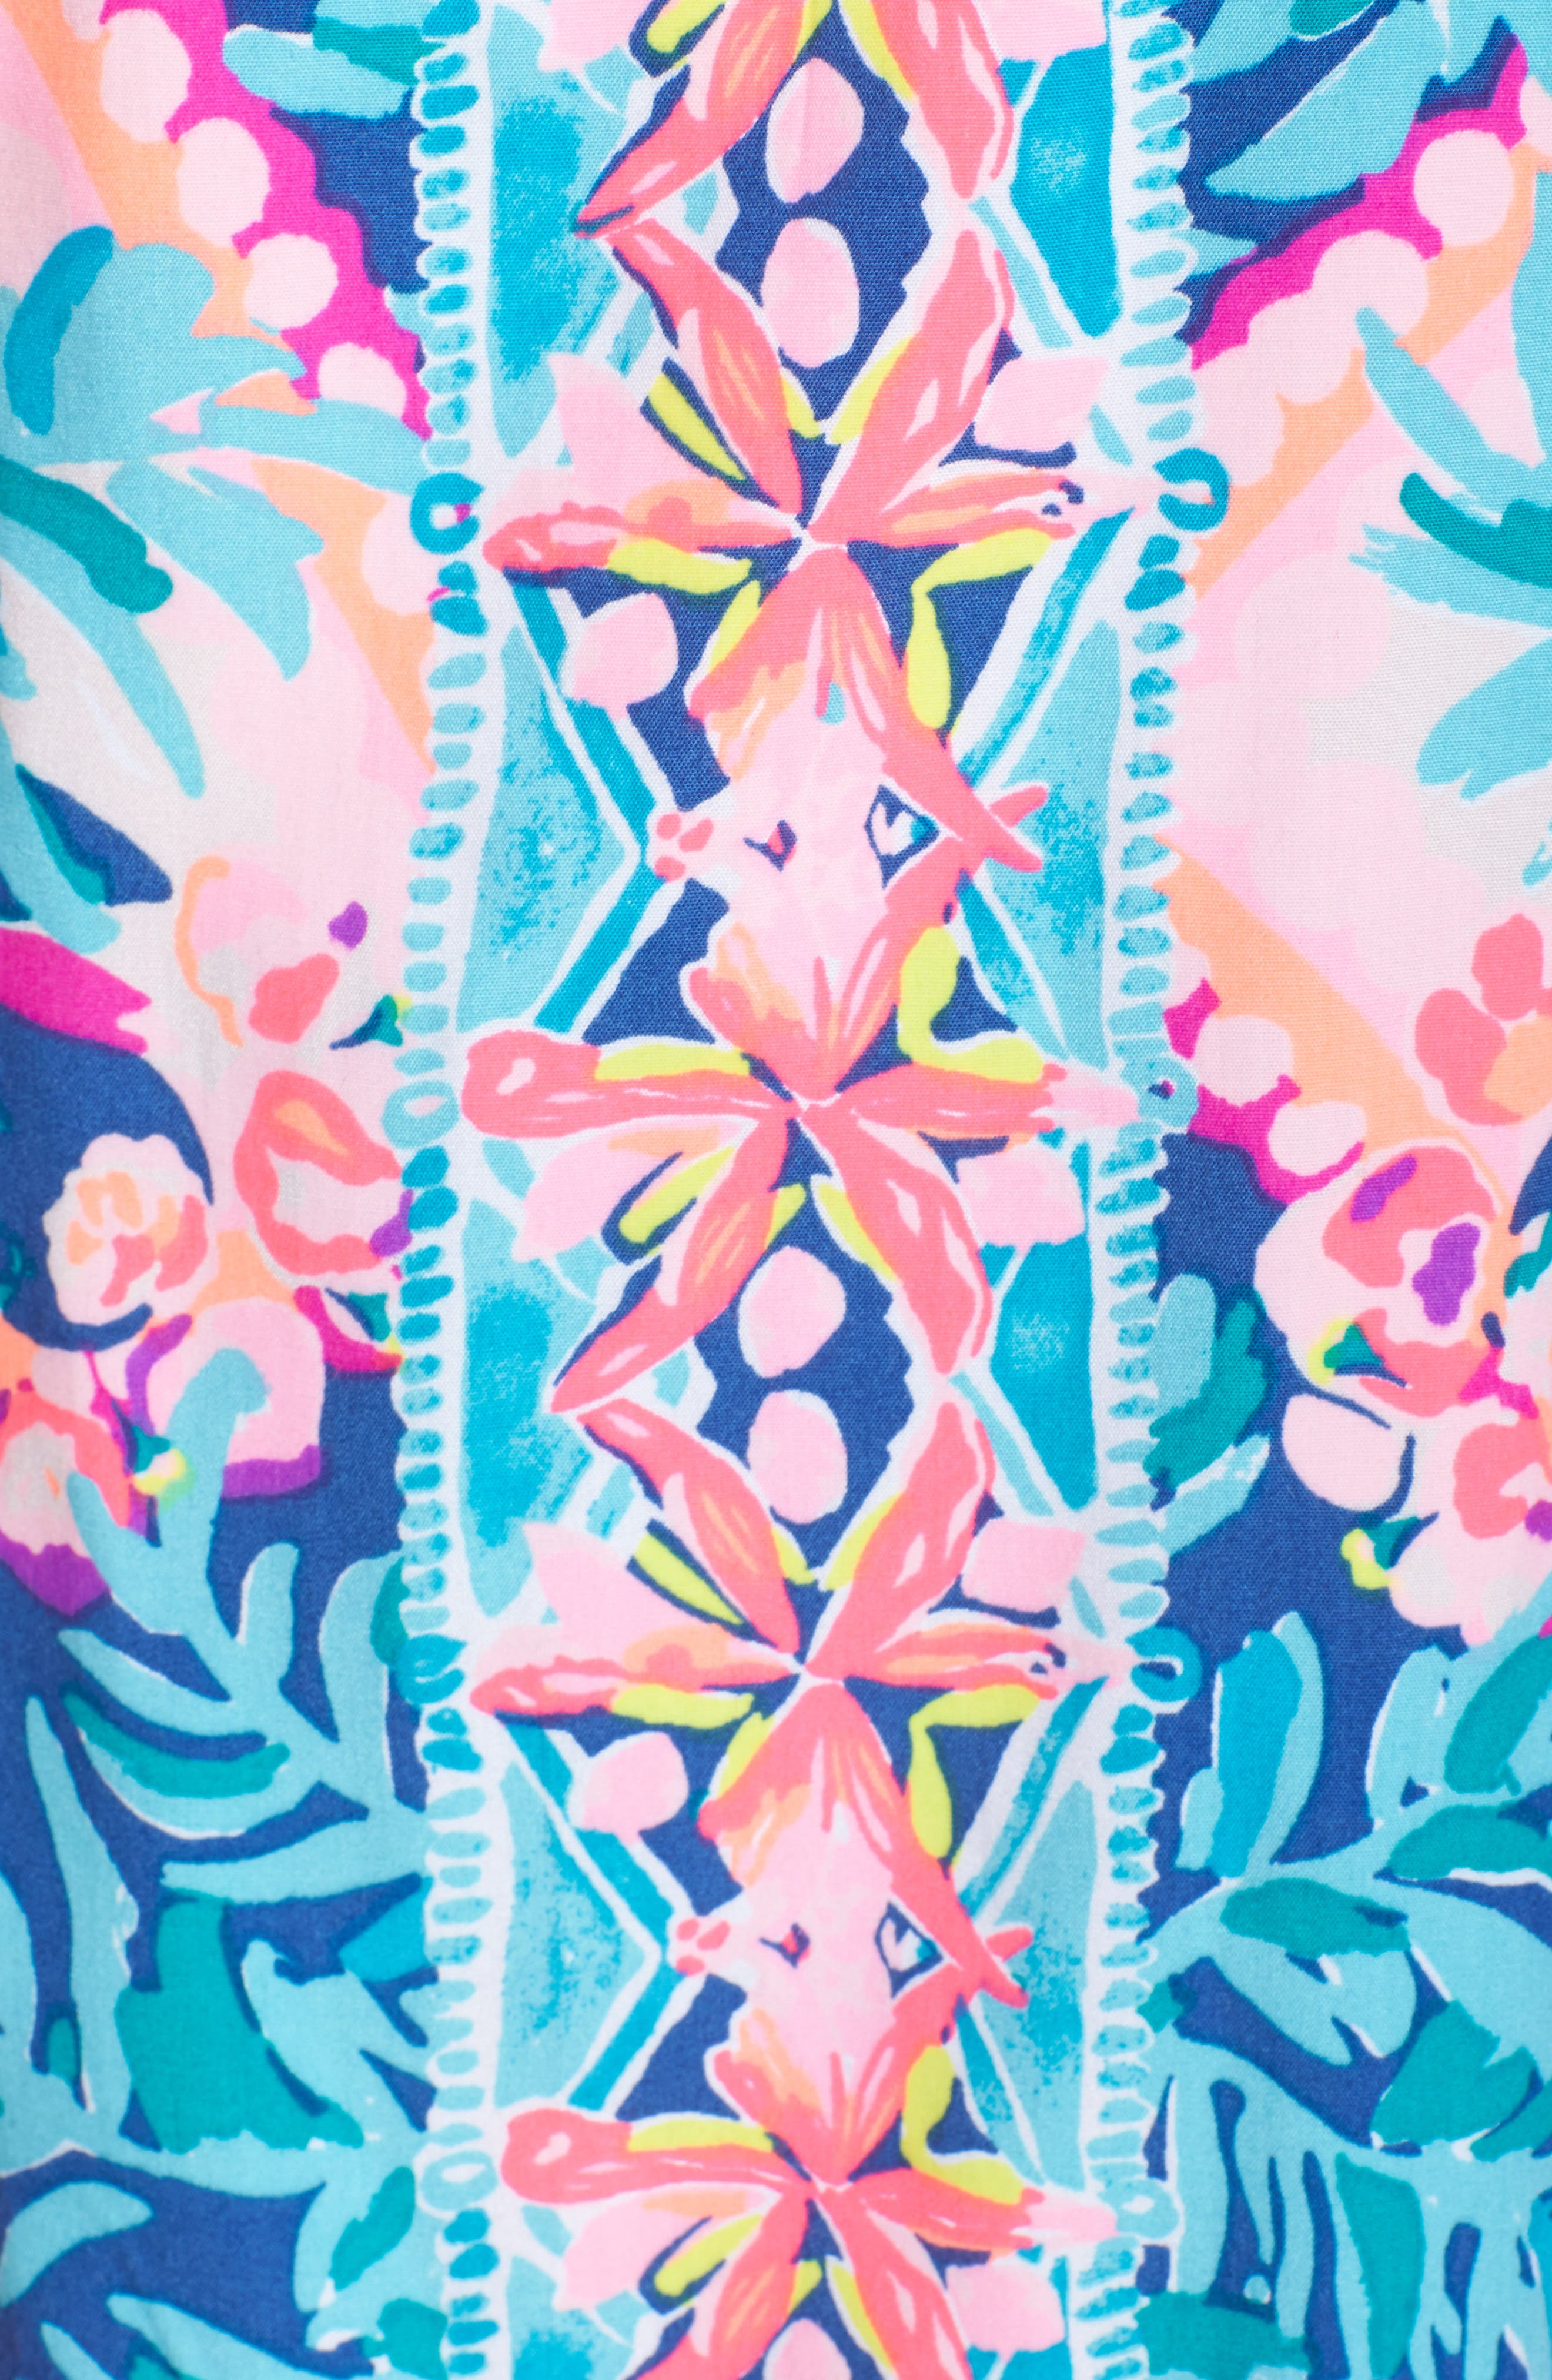 Tanya Skirted Romper,                             Alternate thumbnail 5, color,                             446